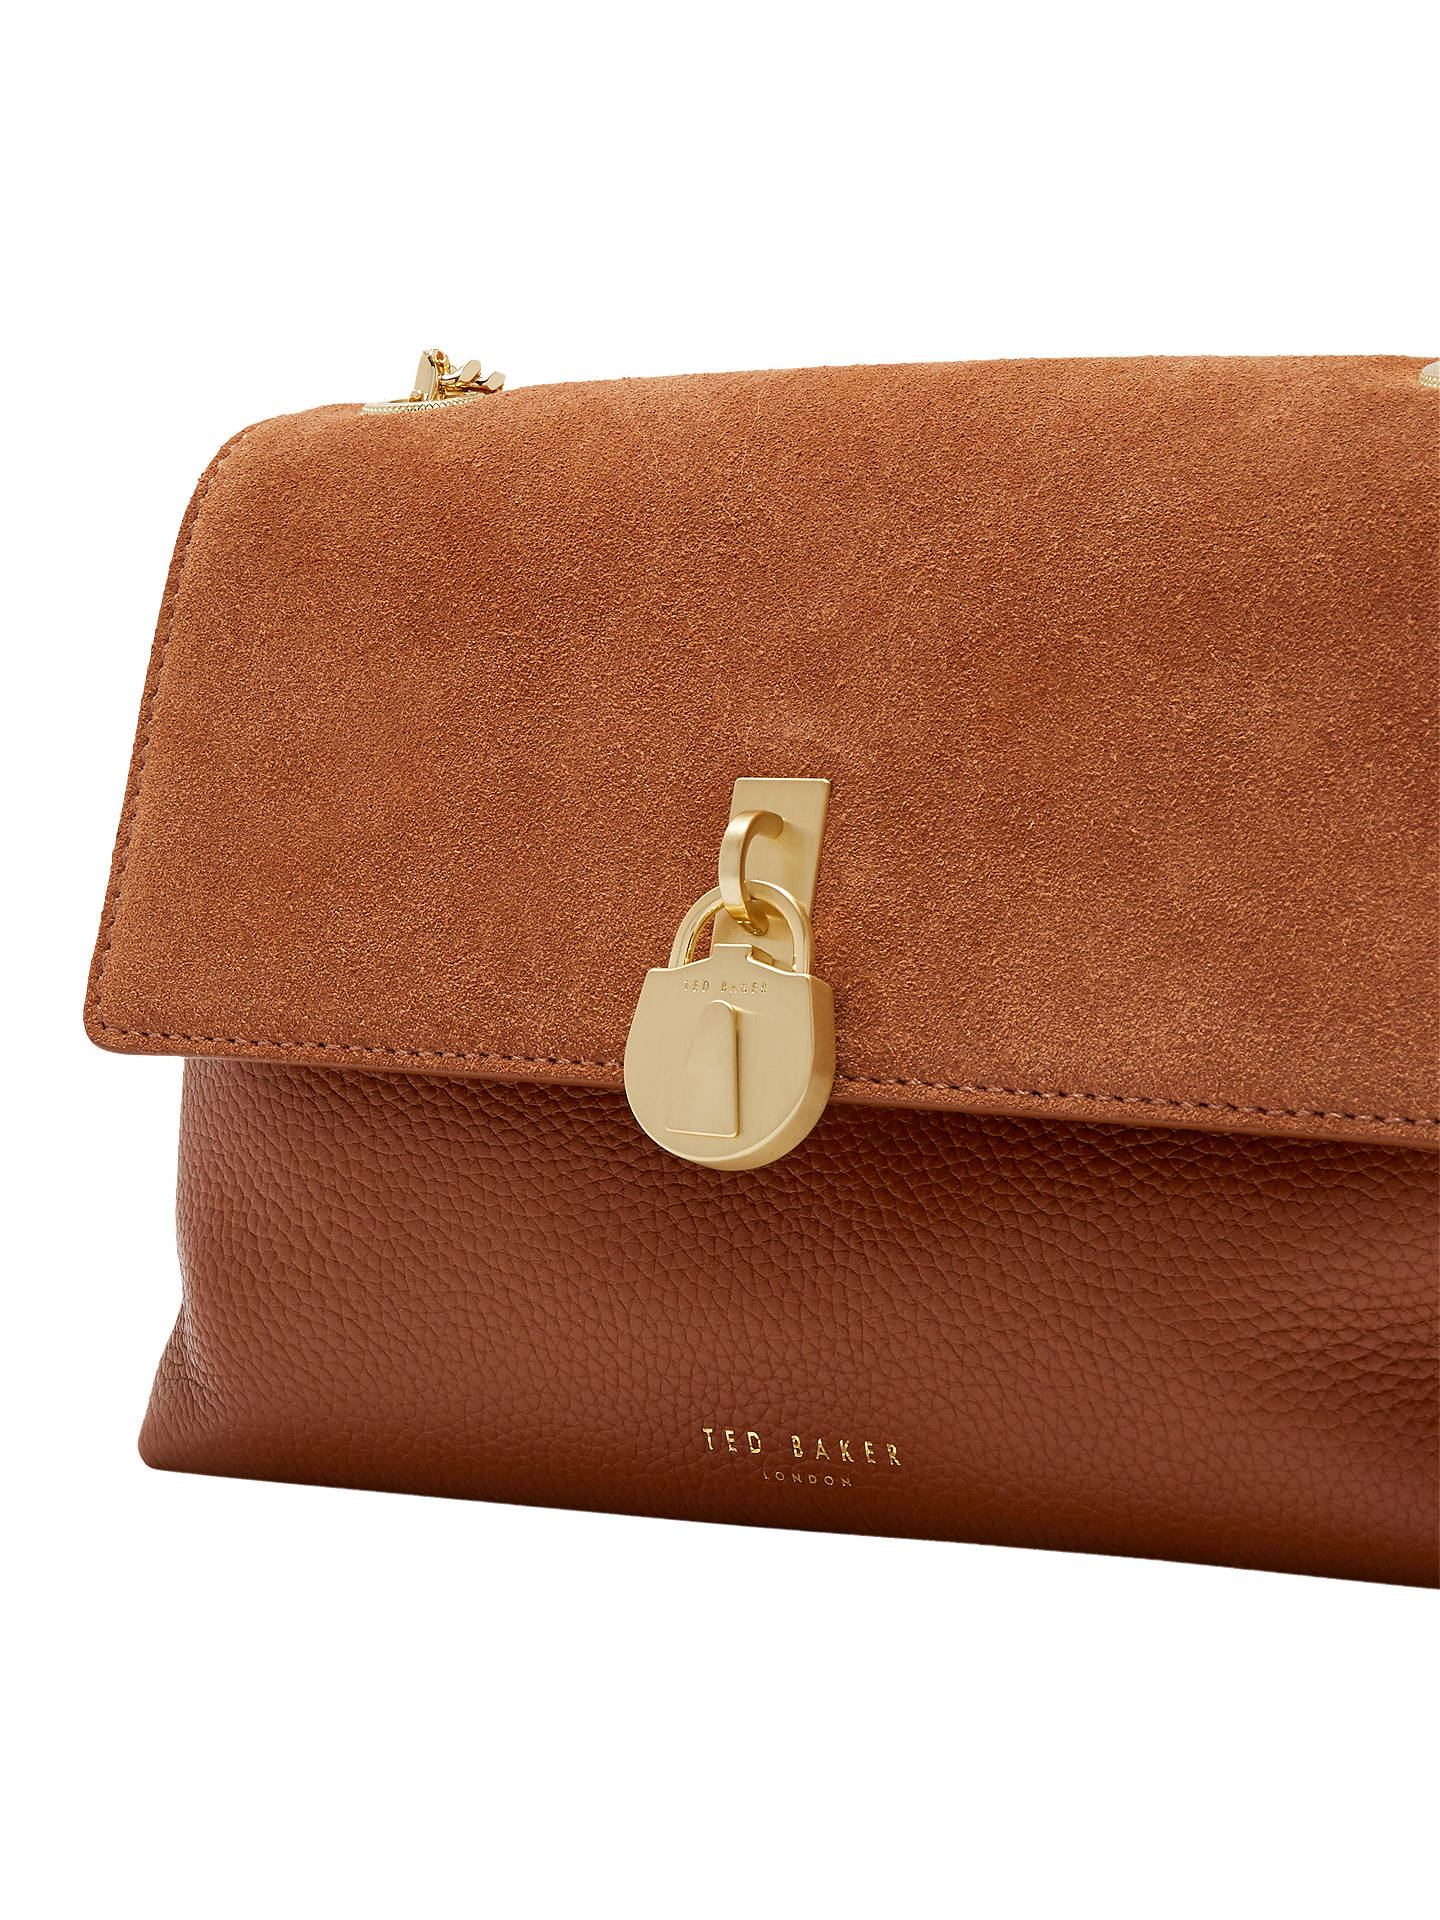 9d186033b9d5 Ted Baker Helena Padlock Detail Leather Cross Body Bag at John Lewis ...